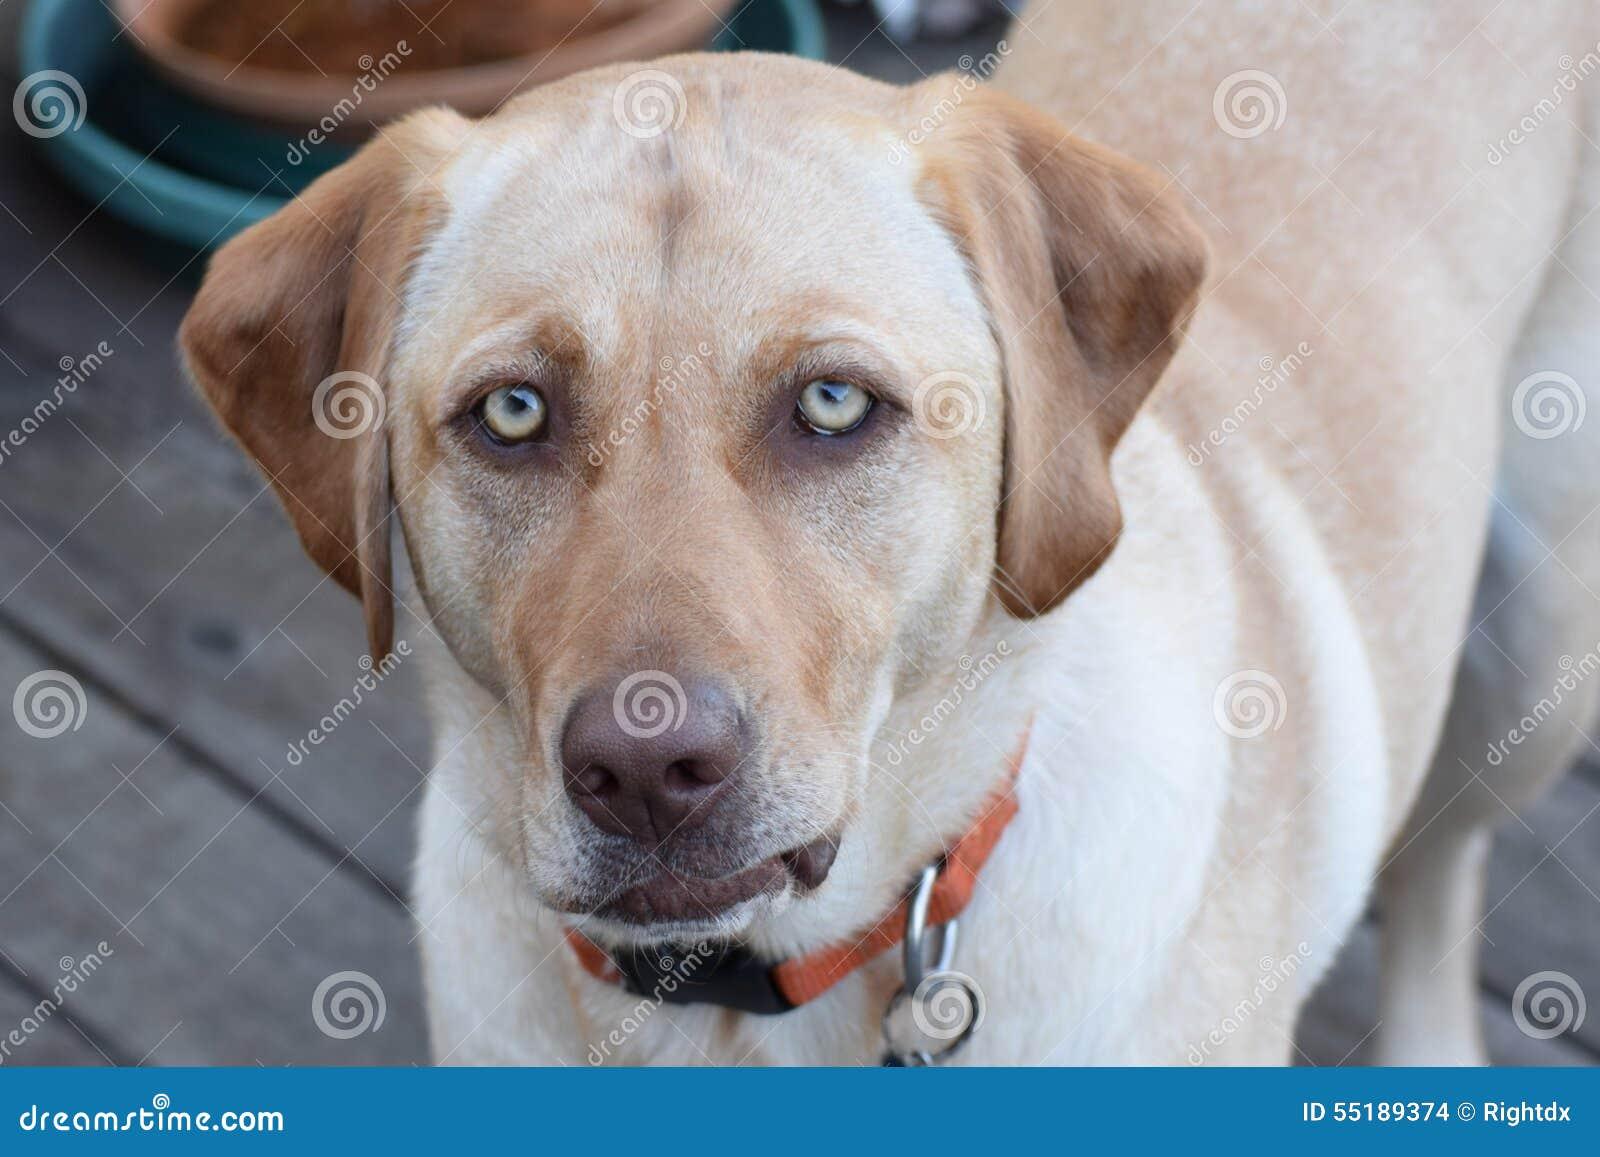 Dog with an Attitude